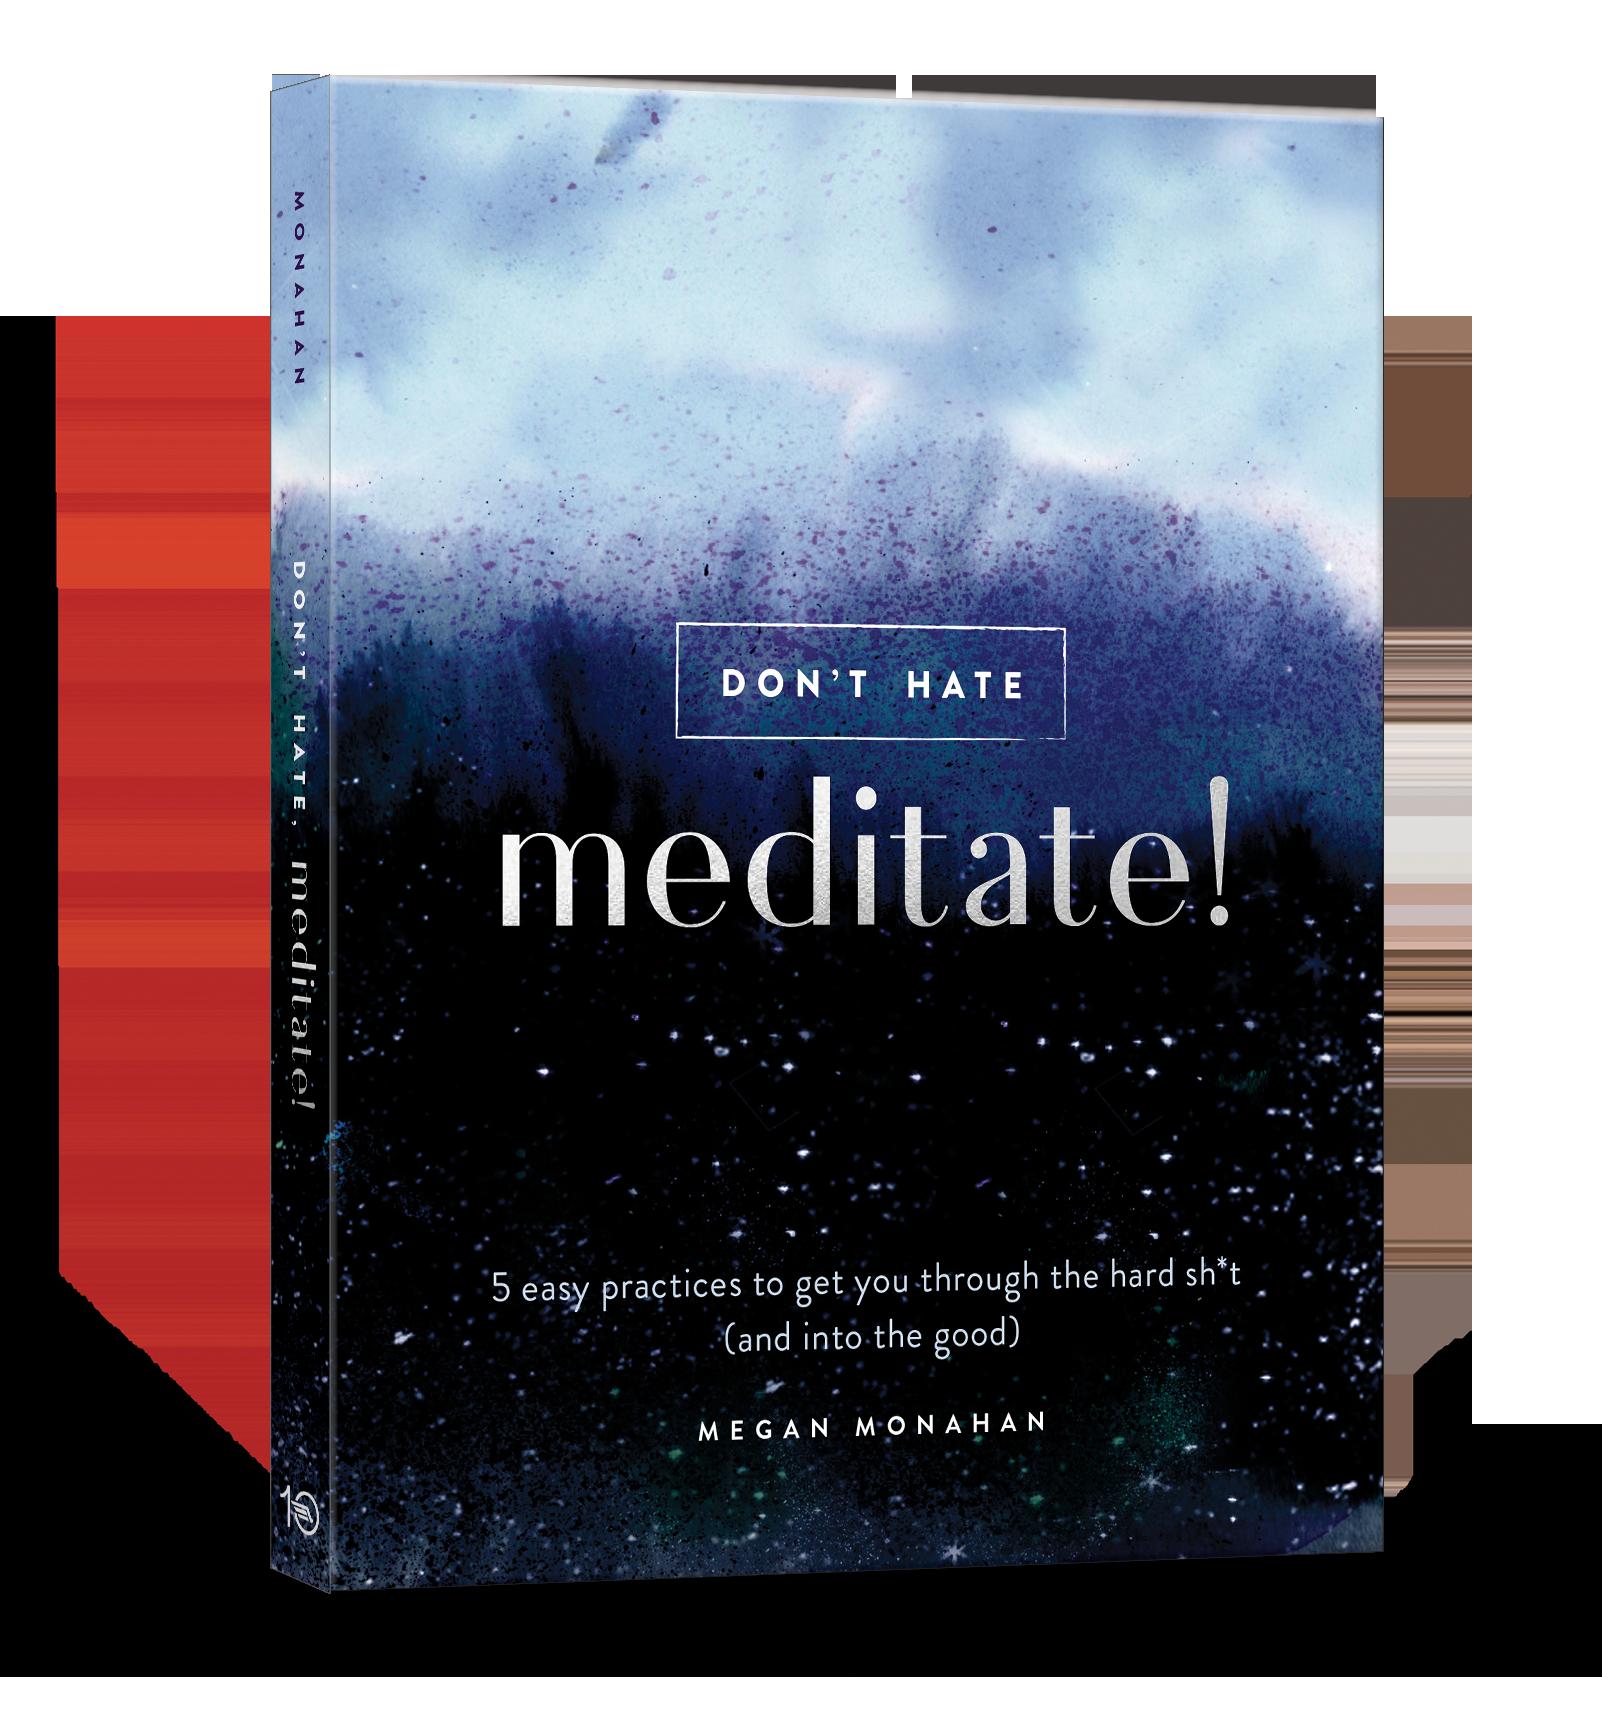 MONAHAN_Meditate_3D Bookweb.png